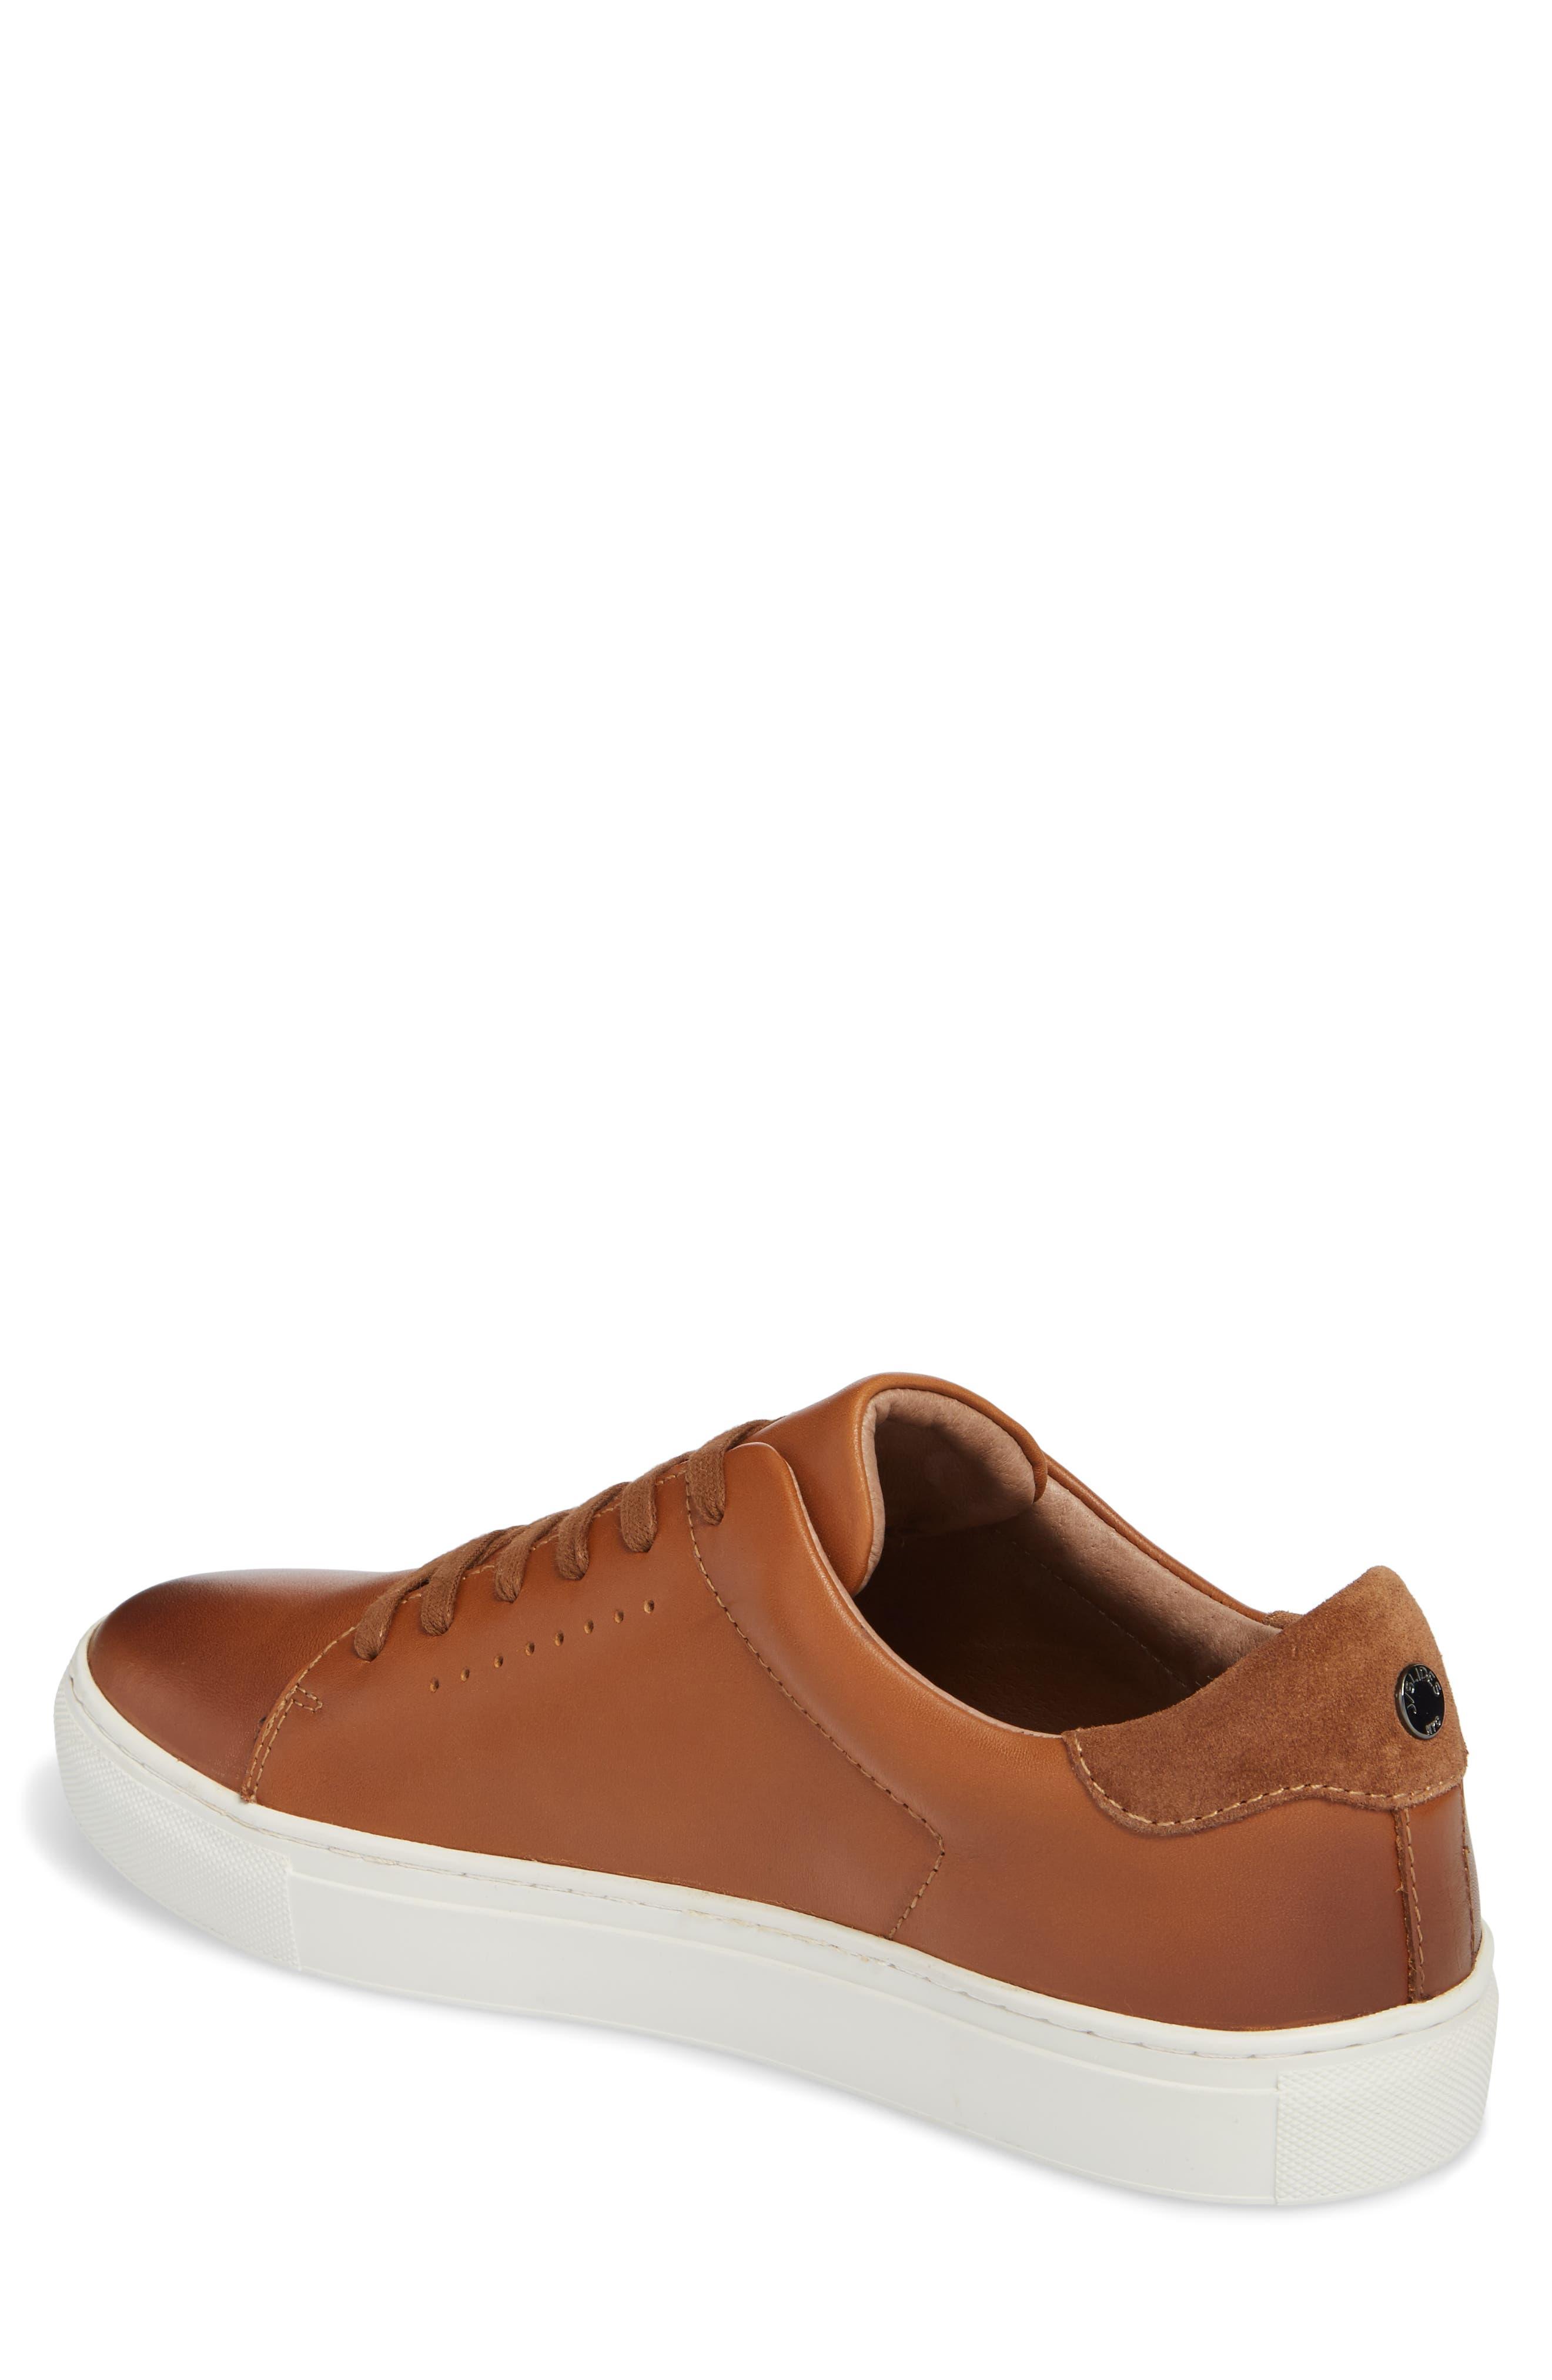 Desmond Sneaker,                             Alternate thumbnail 2, color,                             Tan Leather